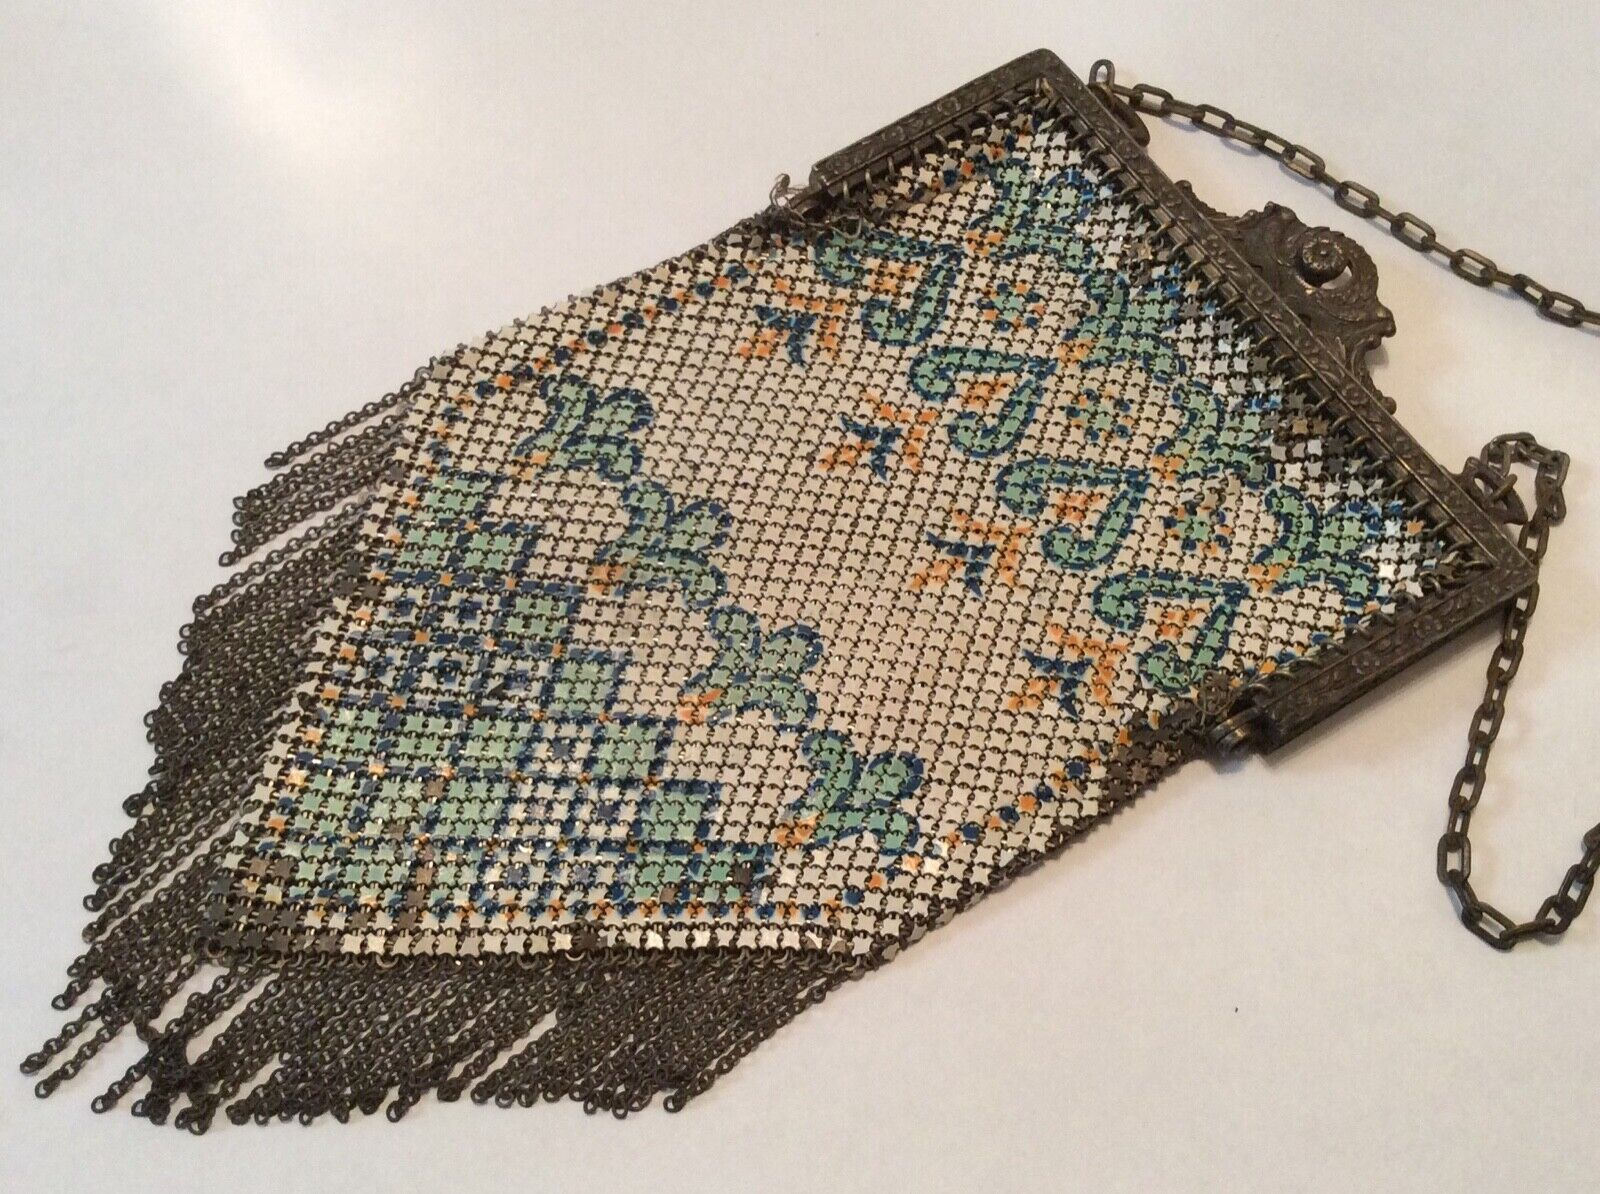 Antique Mandalian MFG Co Enamel Mesh Ladies Handb… - image 1